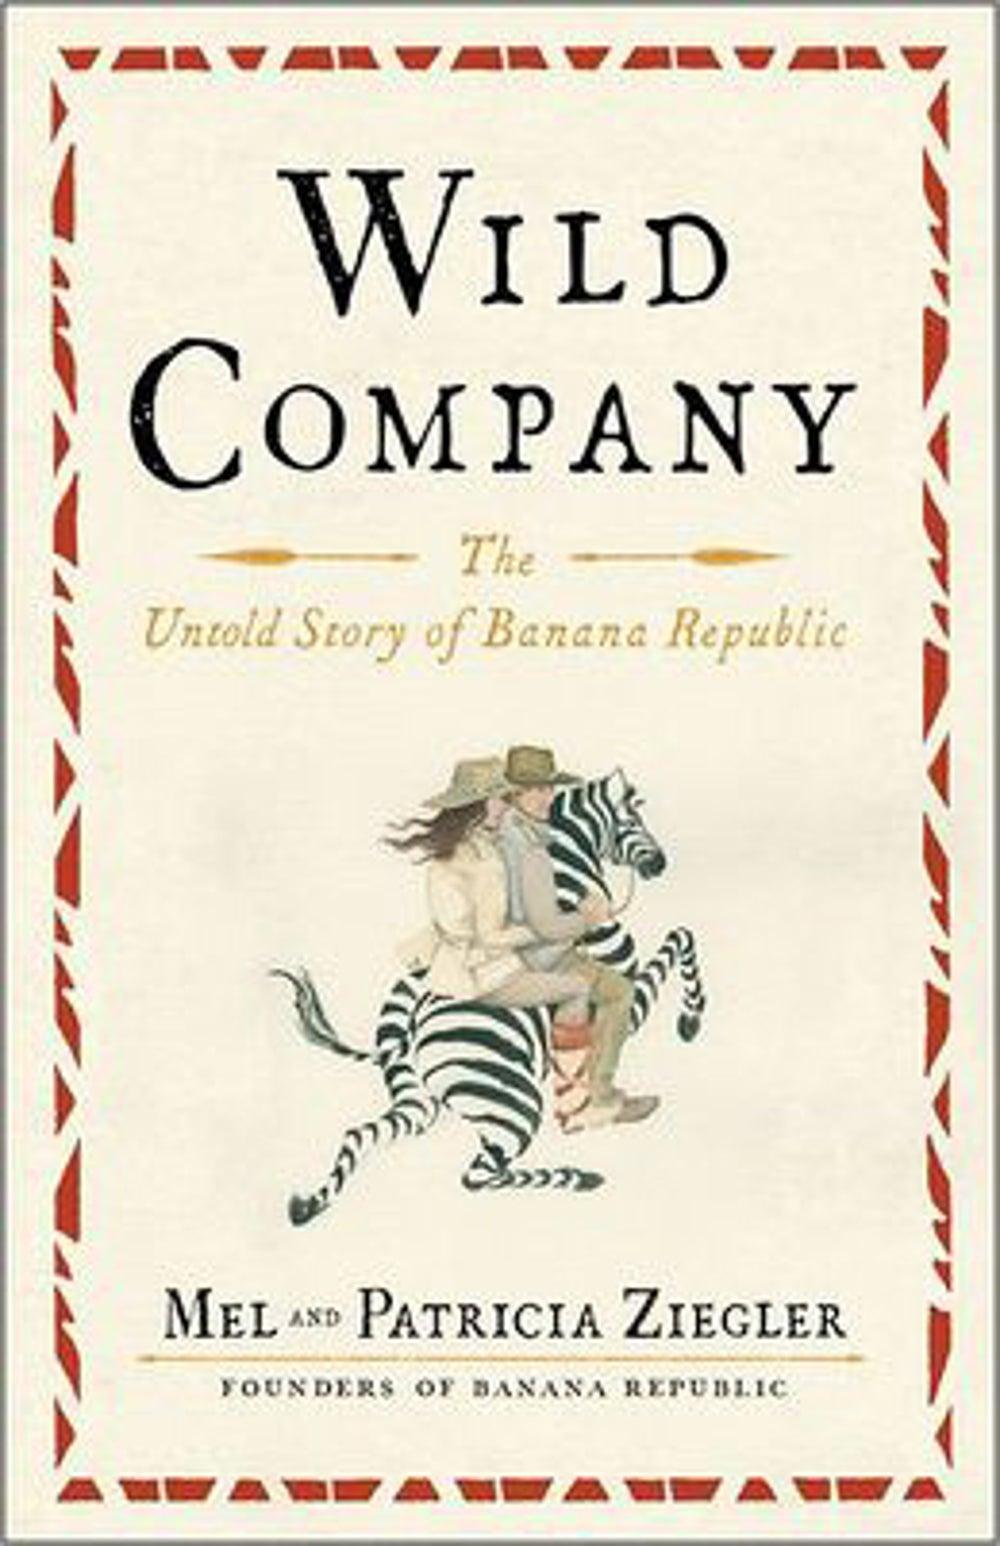 Wild Company by Mel and Patricia Ziegler